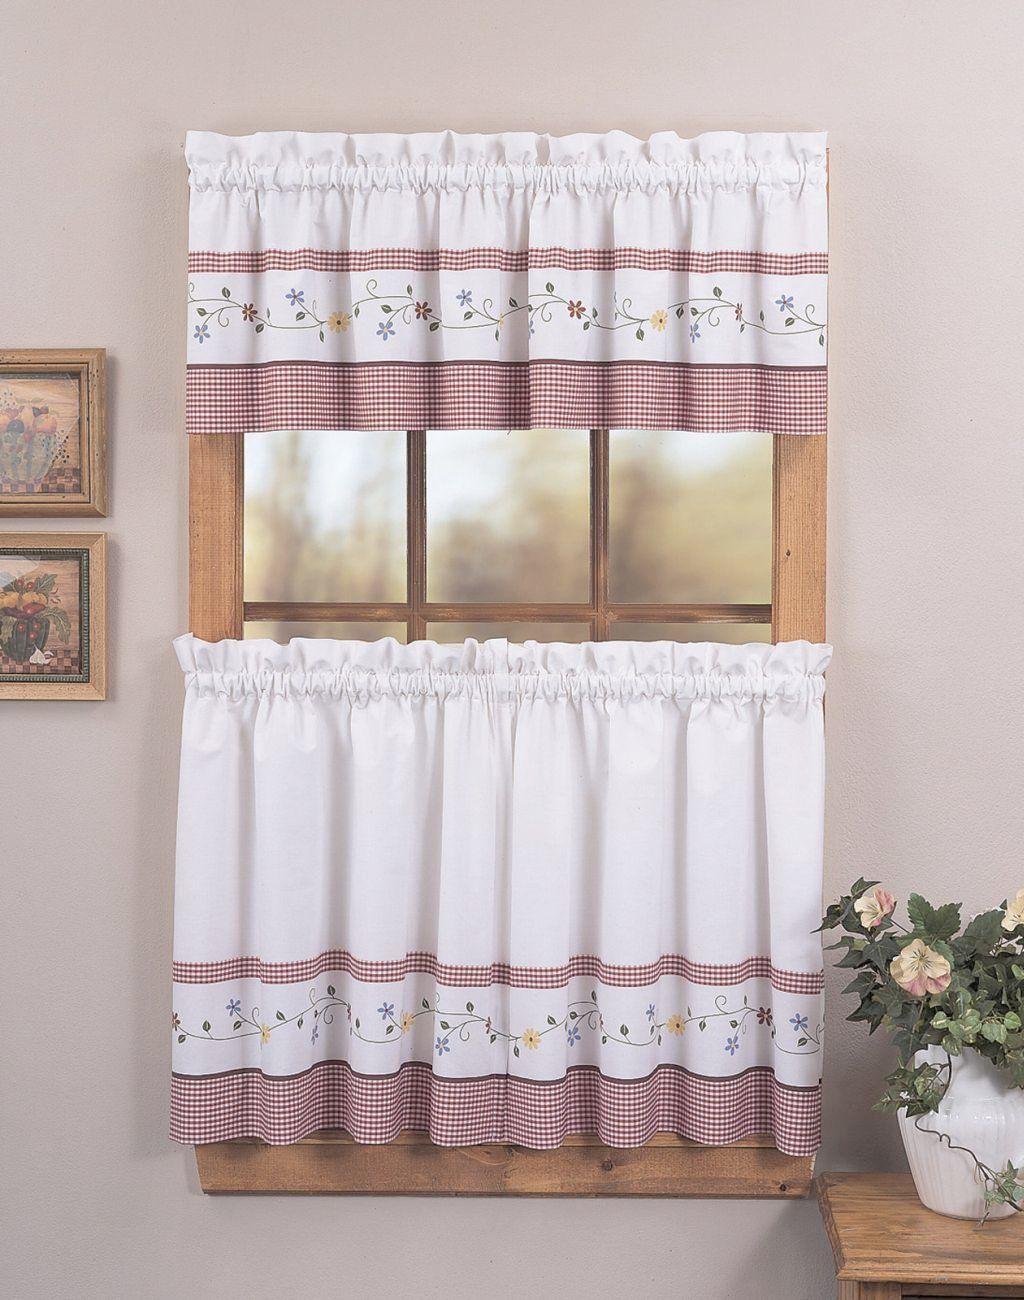 Ikea Kitchen Curtains  Home Design  Cheap home decor, Home decor